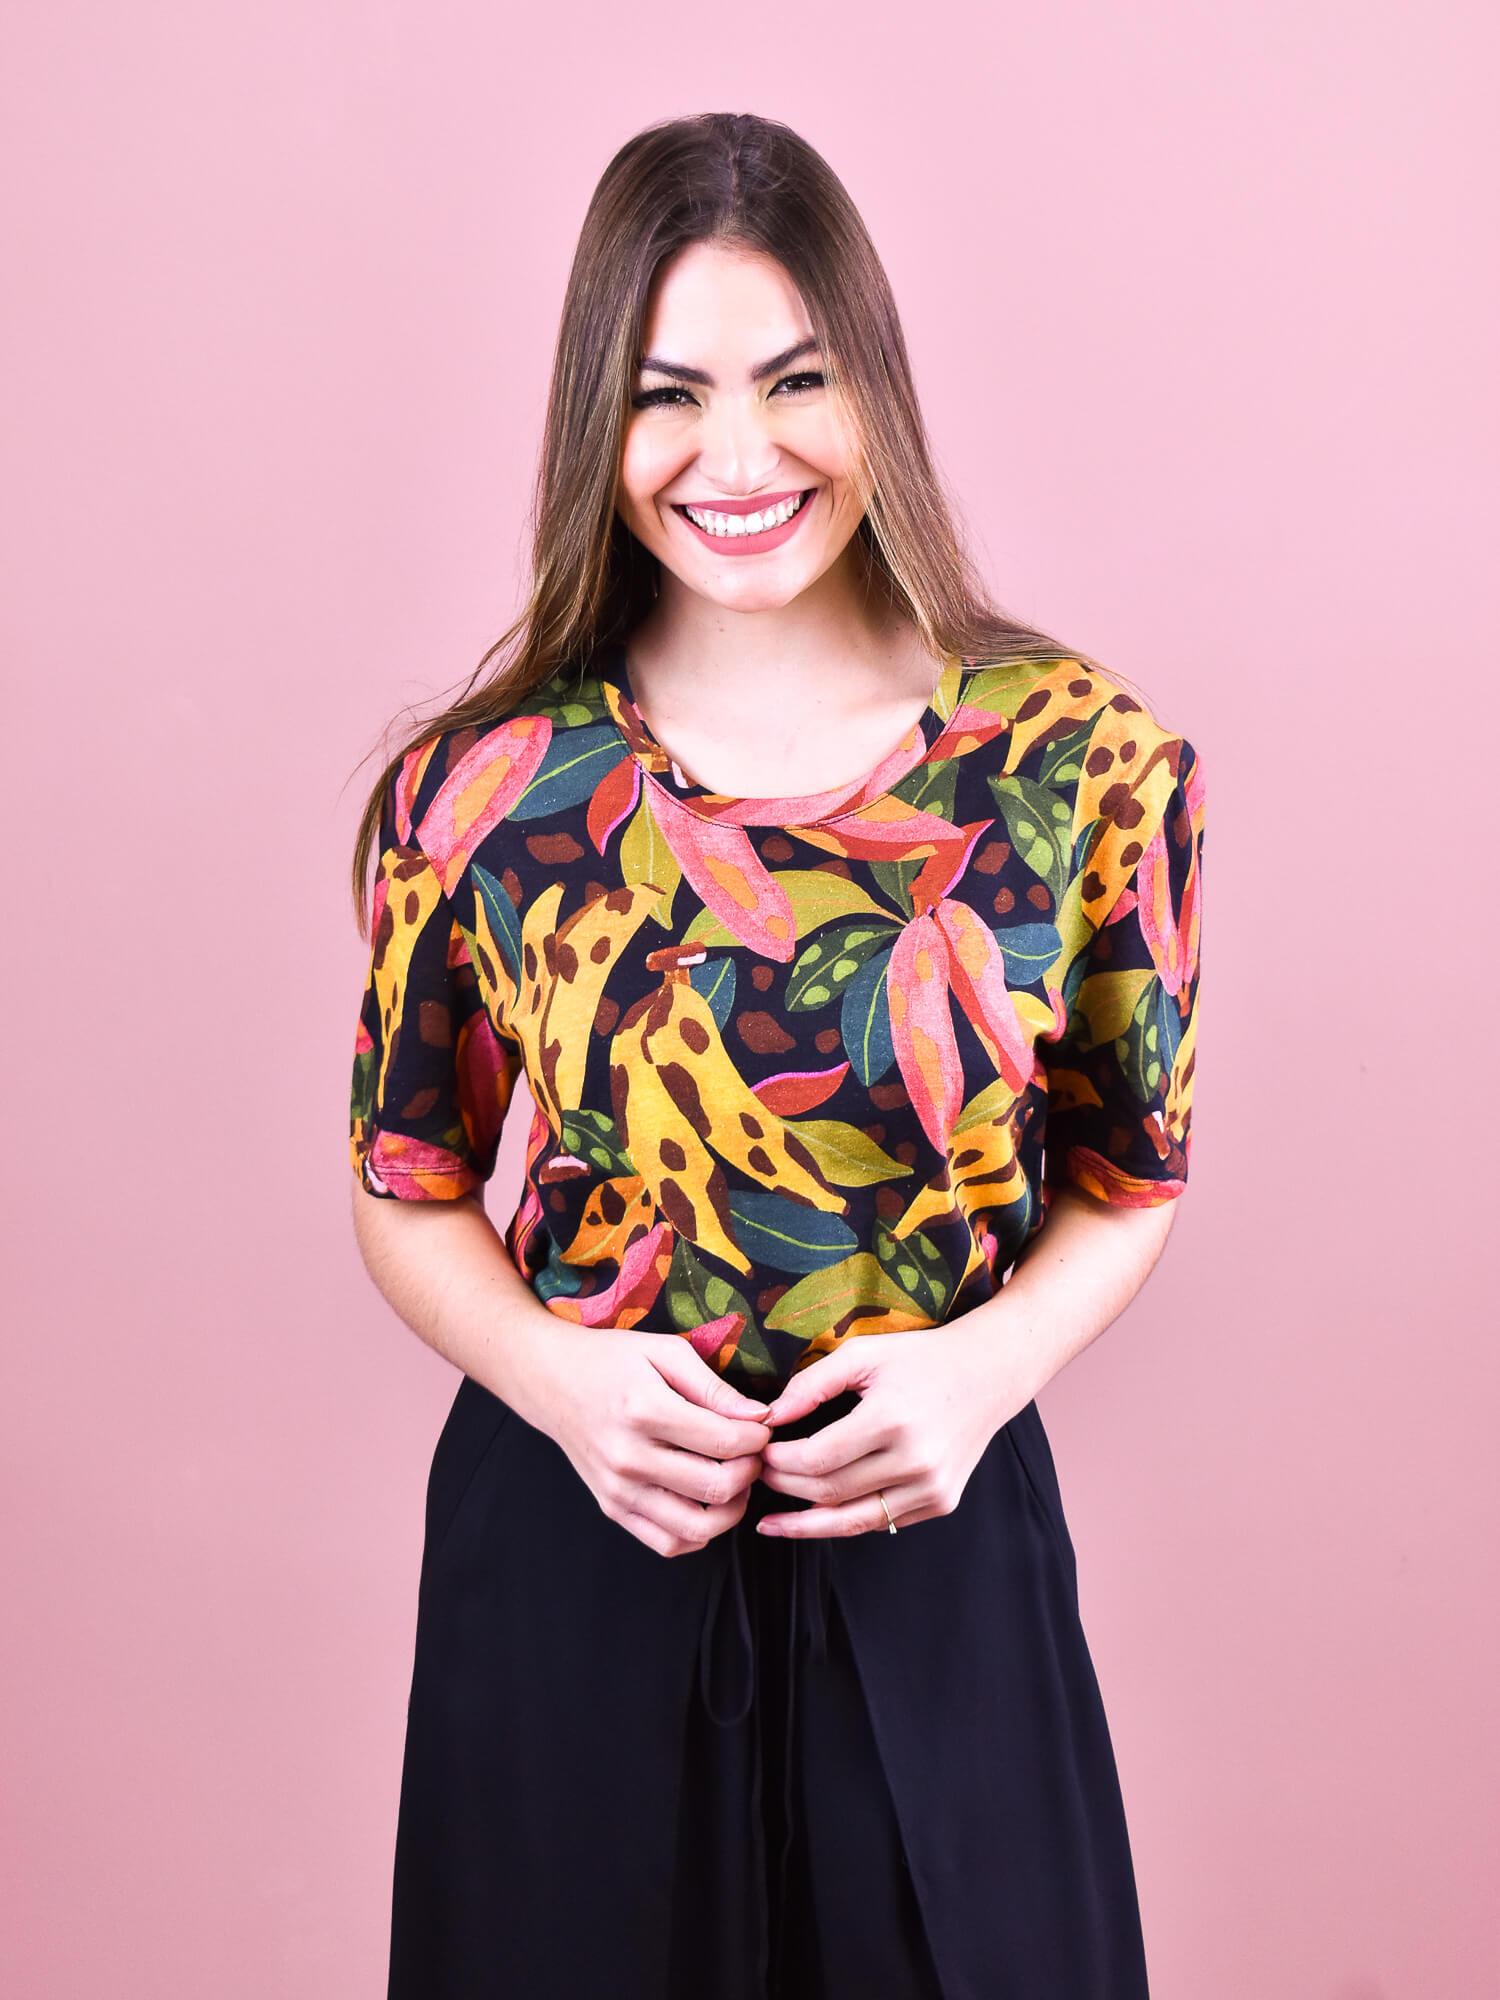 Tshirt Farm Banana Pintada  - Carmelina.com.br